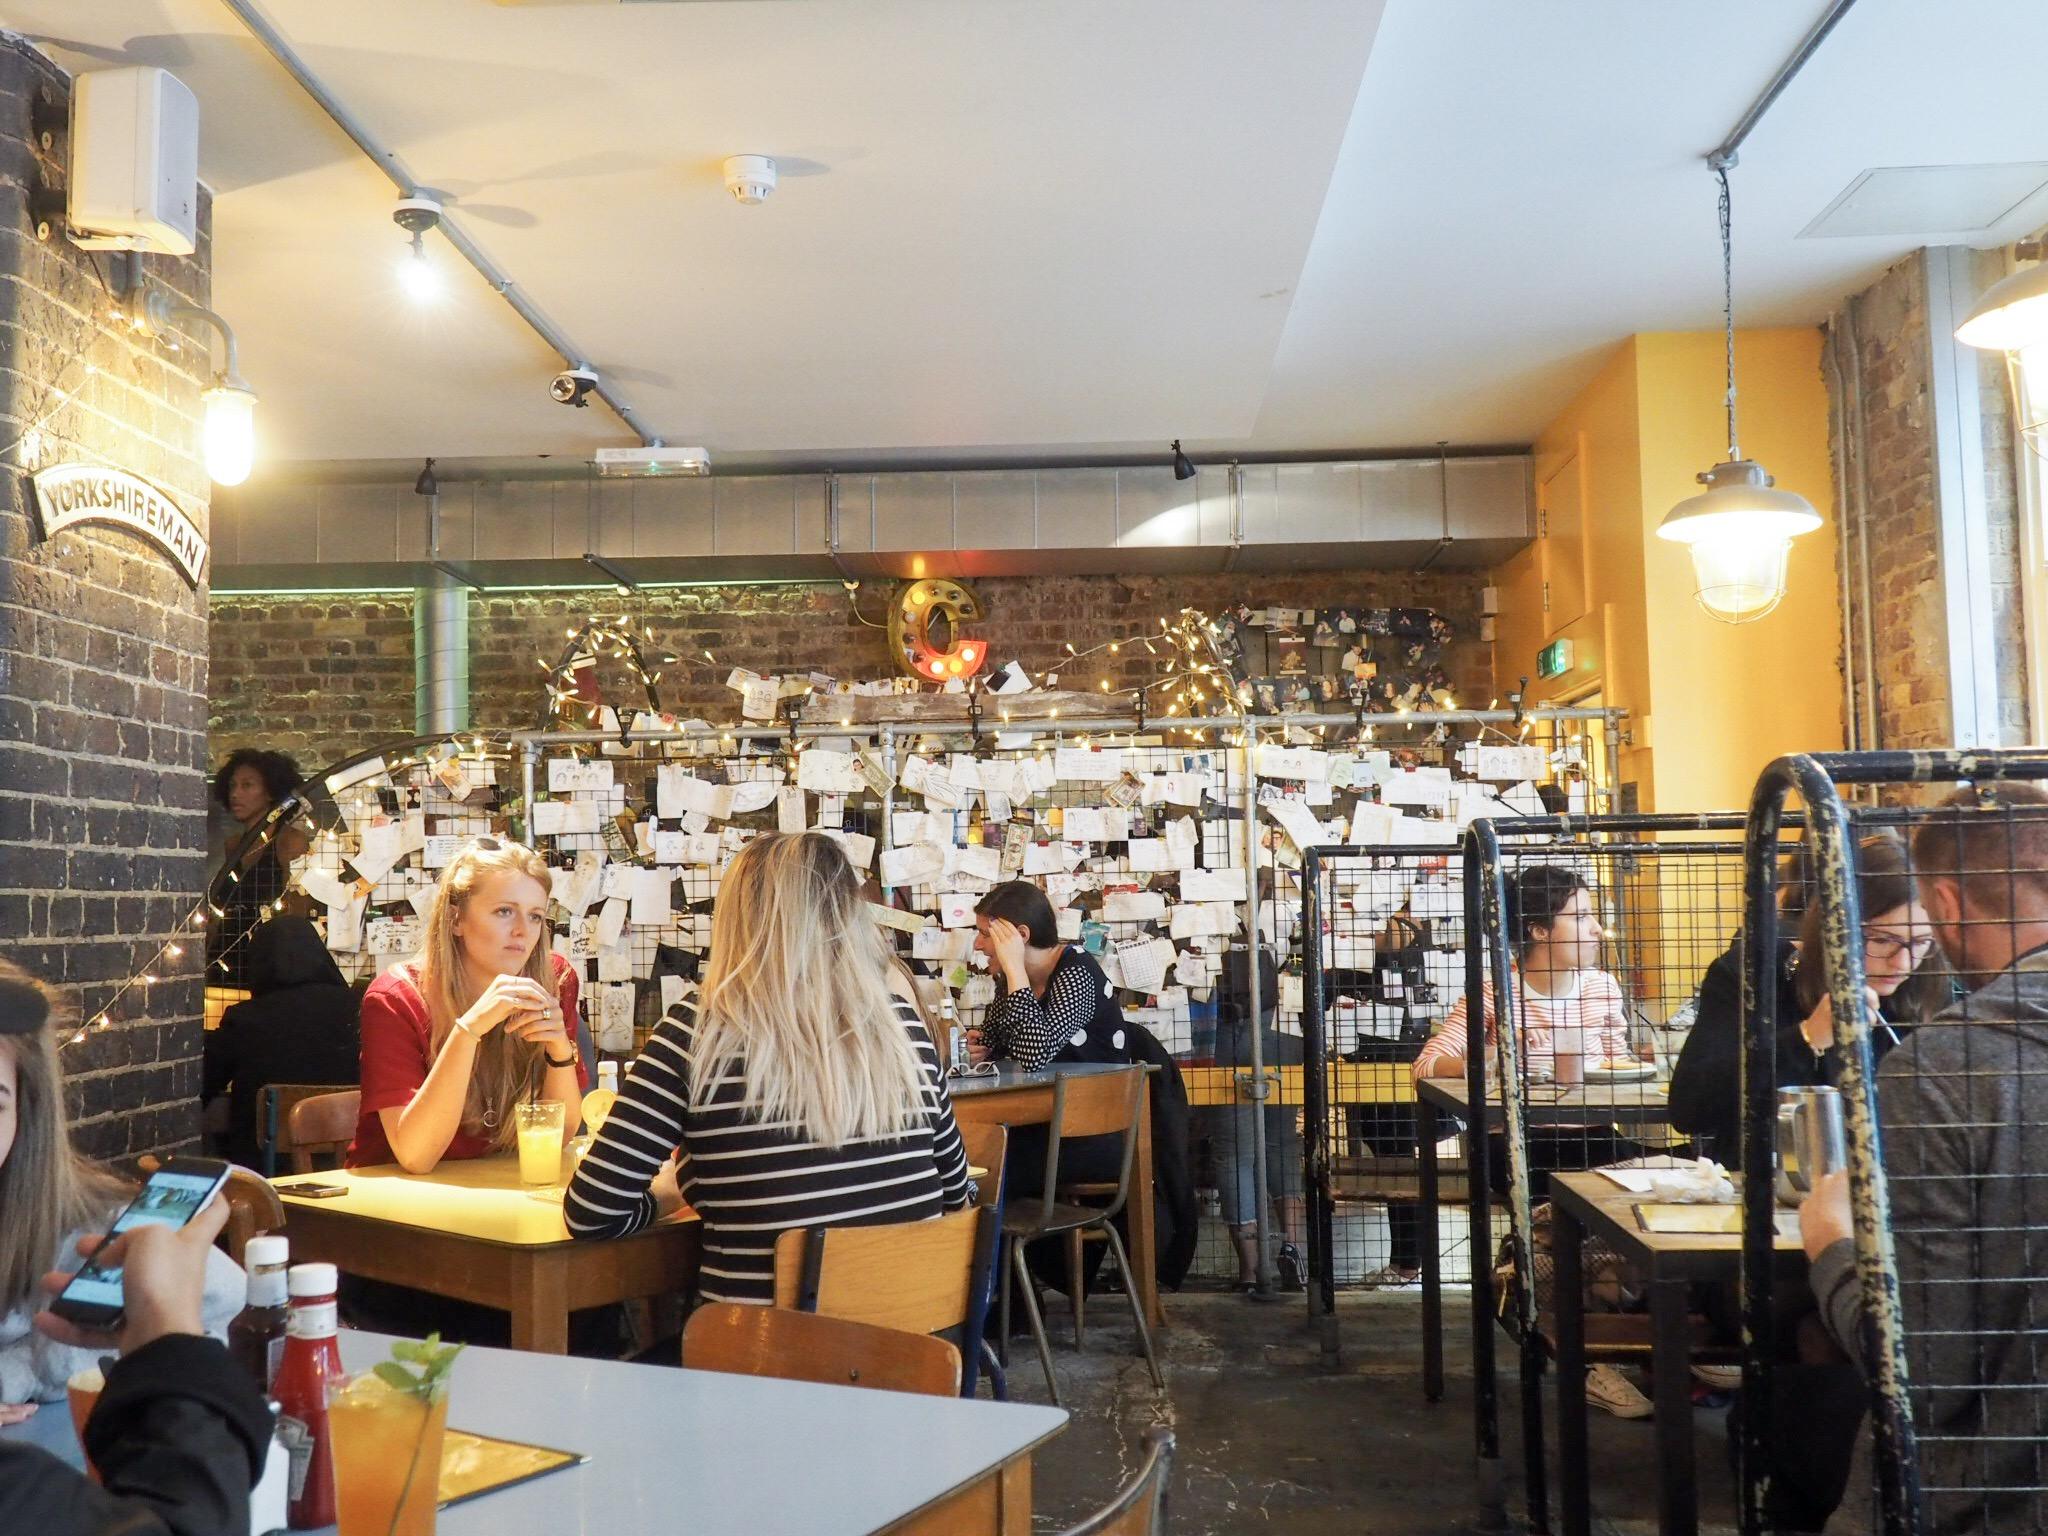 The Breakfast Club Spitalfields market